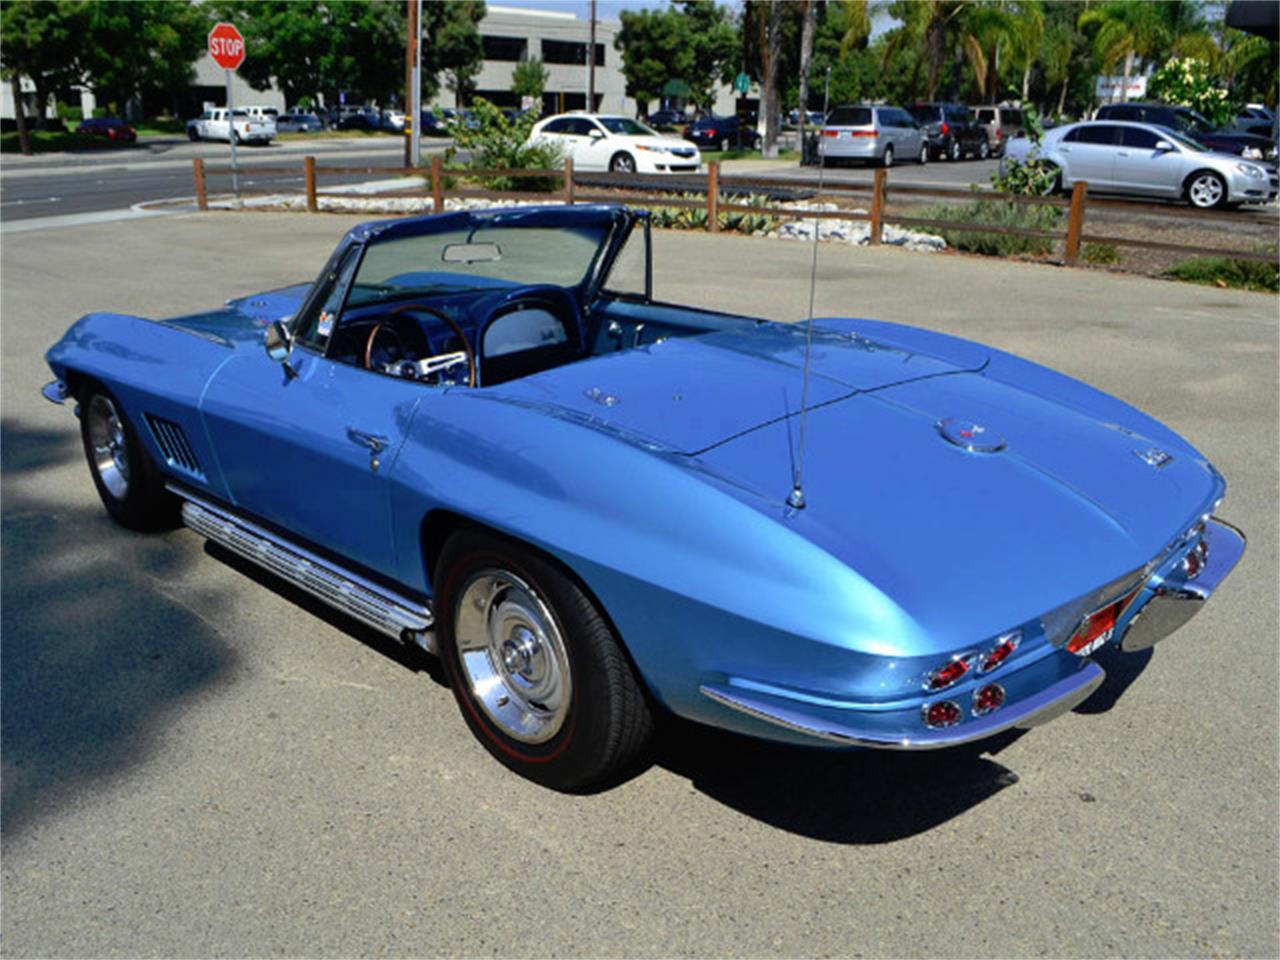 Large Picture of '67 Chevrolet Corvette located in California - $149,888.00 - MQNE